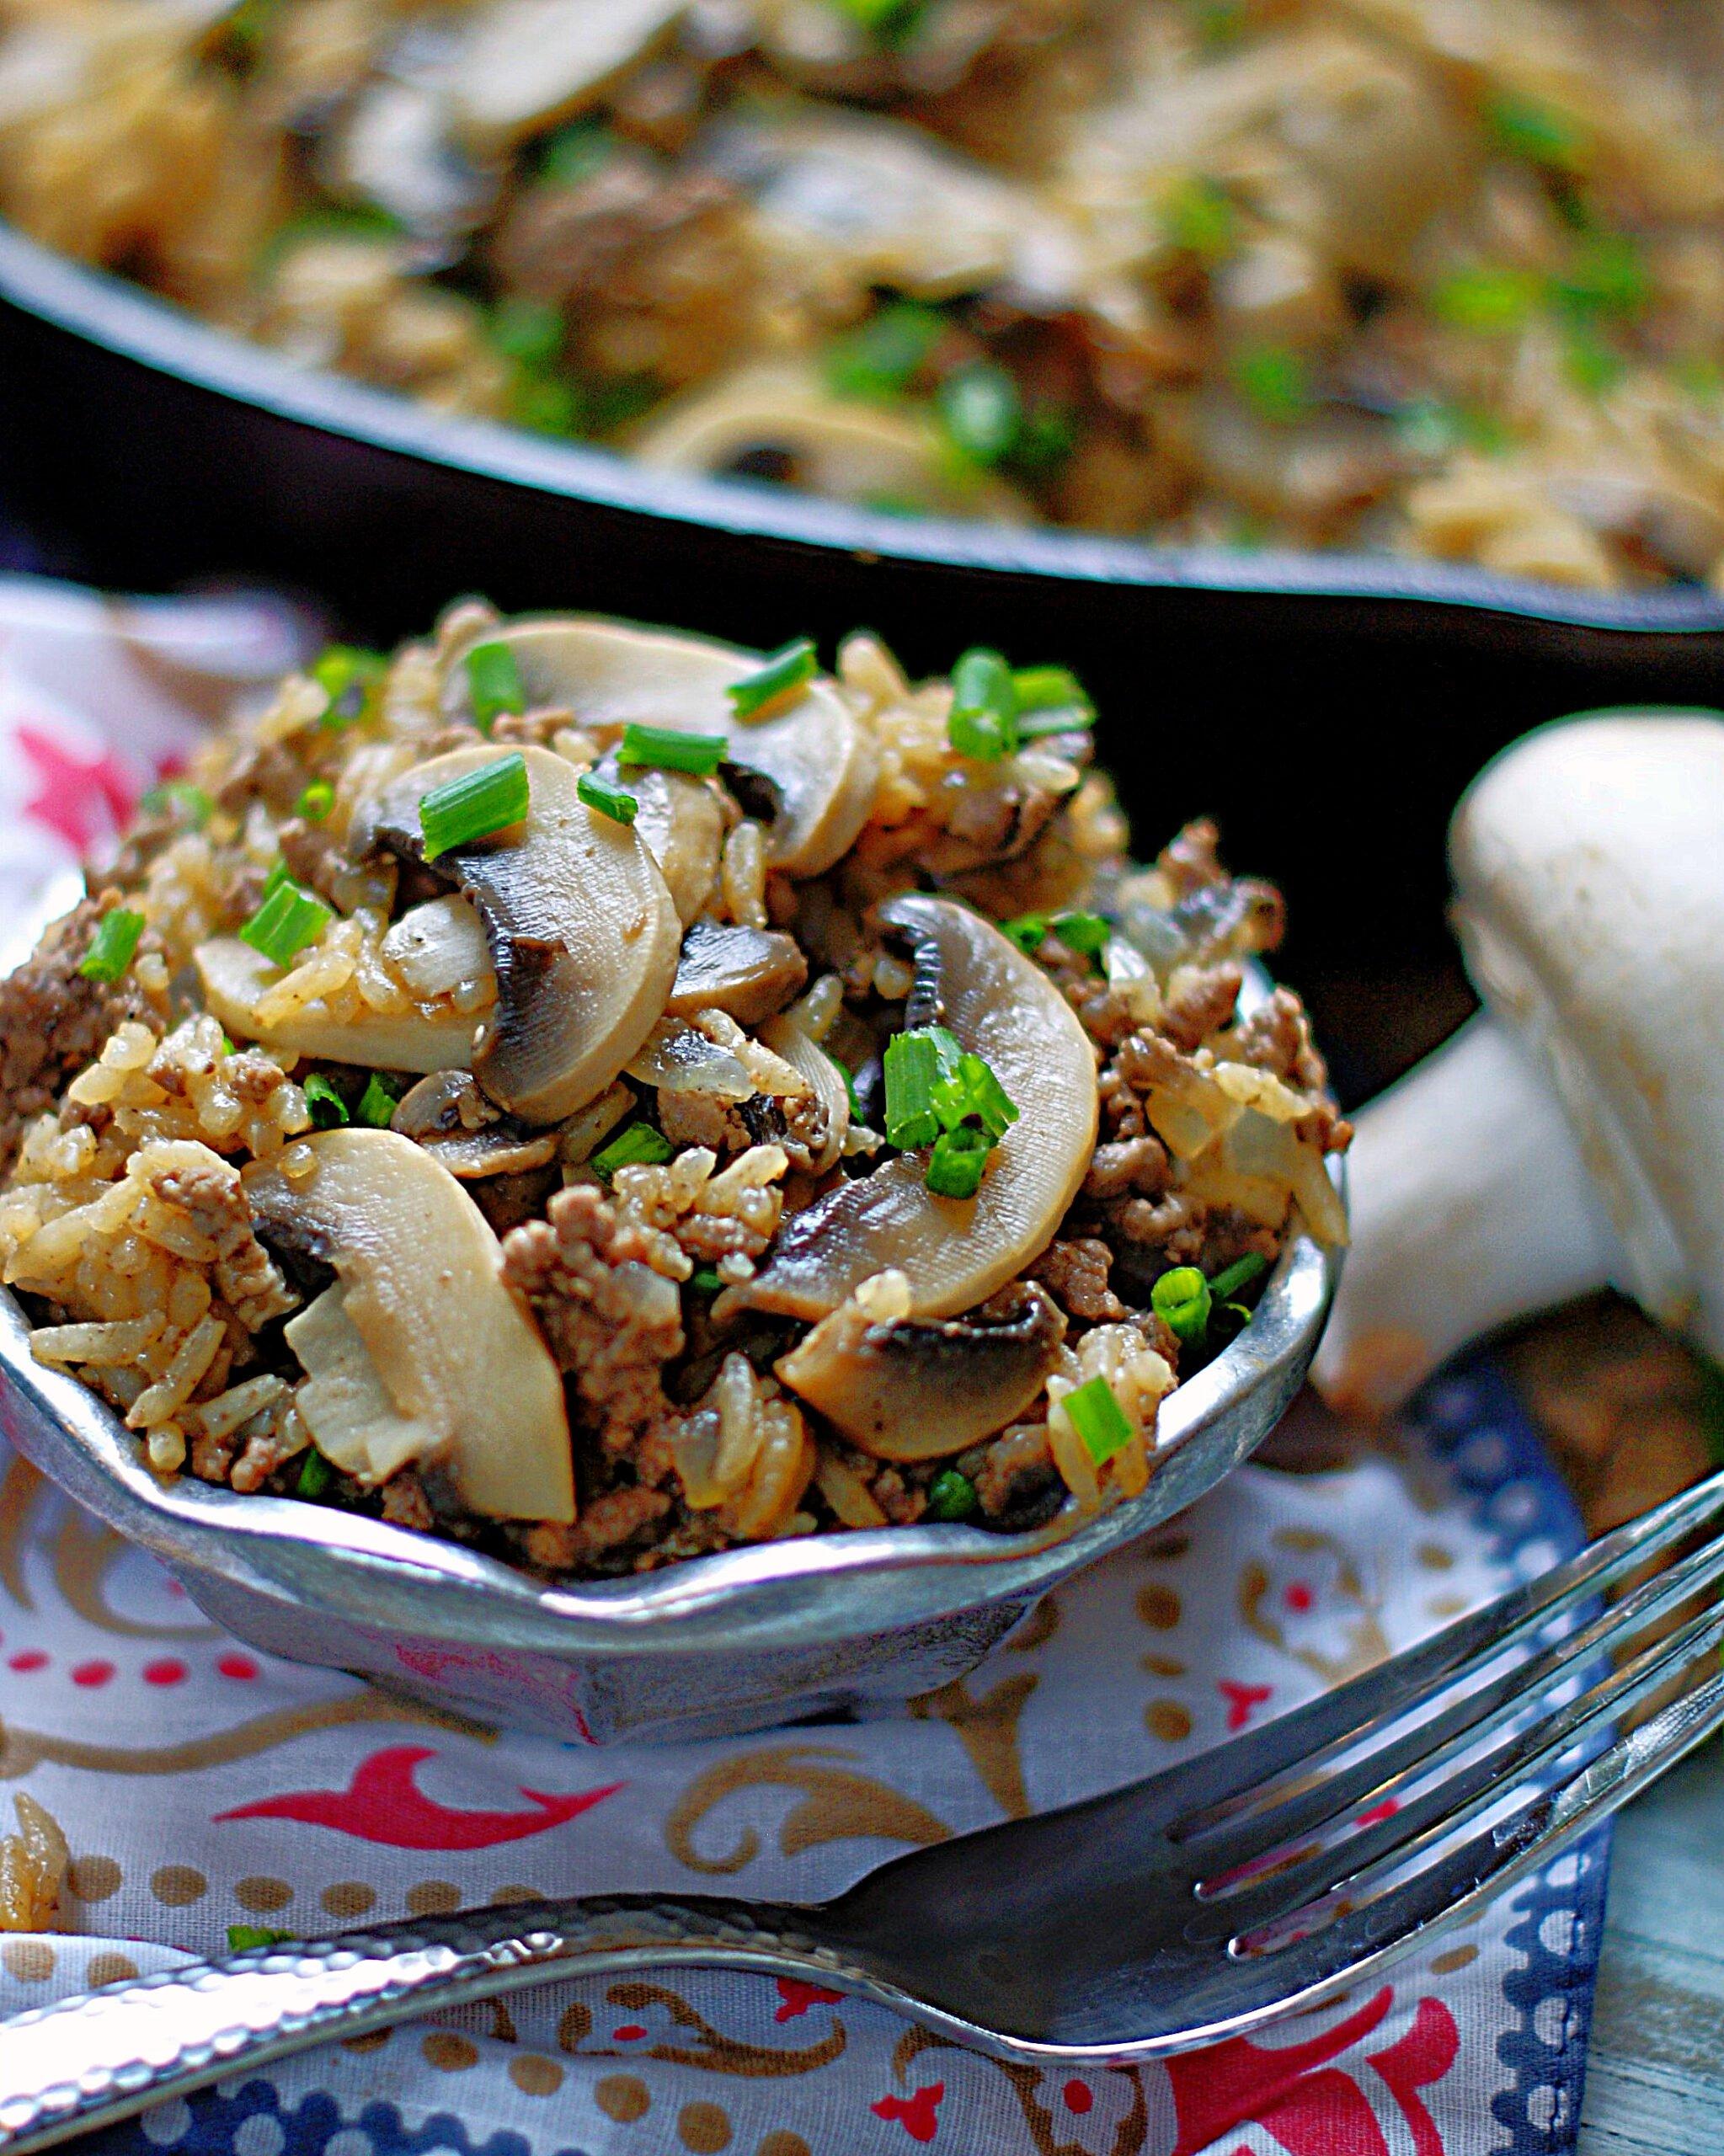 Beef & Mushroom Rice in a bowl